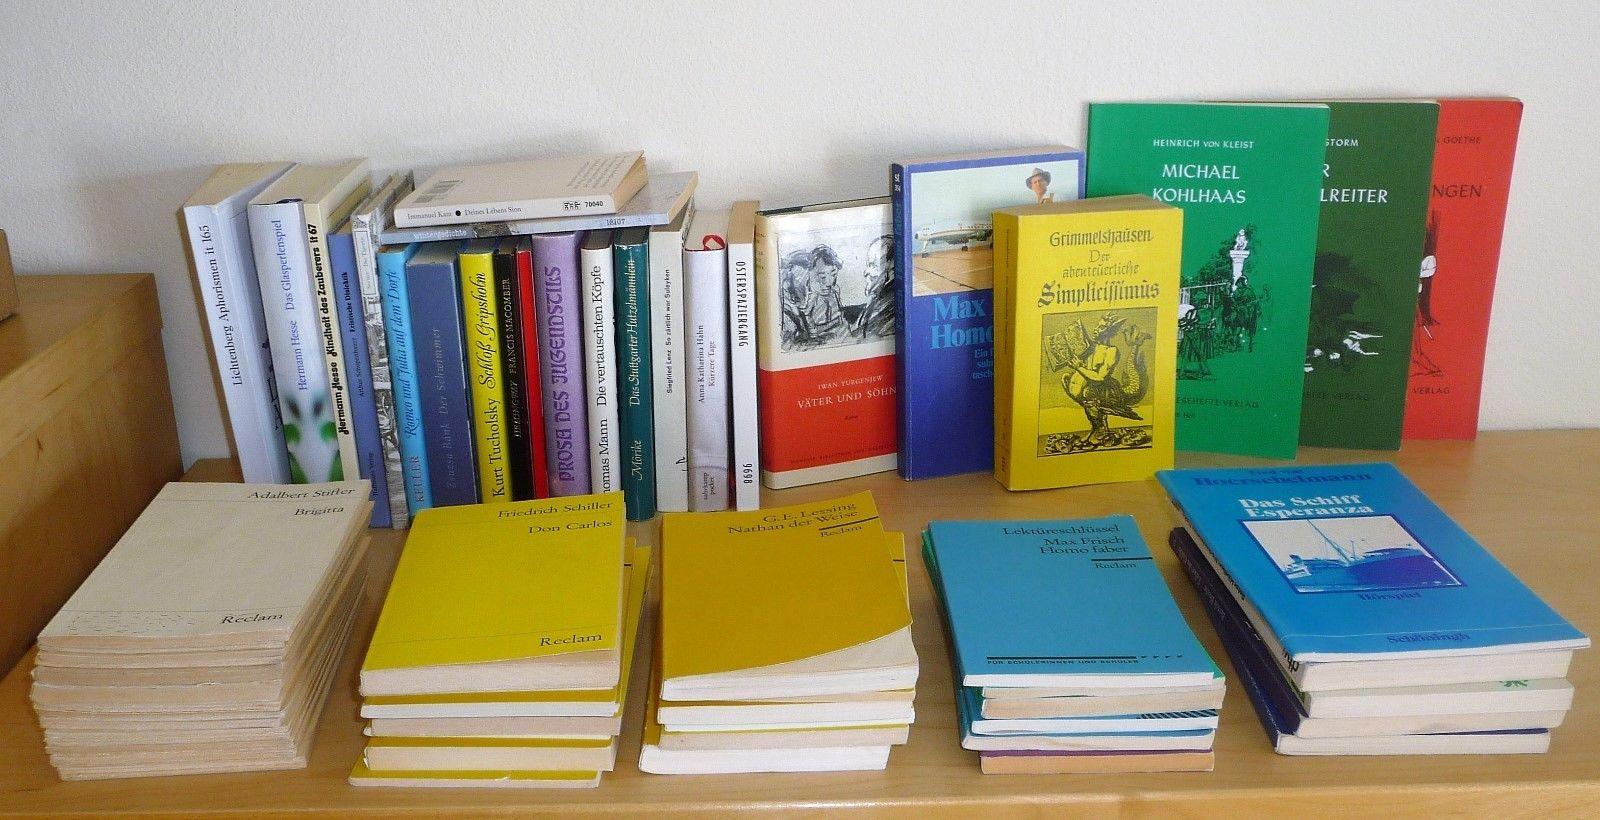 Sammlung 63 Bücher Reclam u. Andere Klassiker Weltliteratur Goethe Hesse Rilke